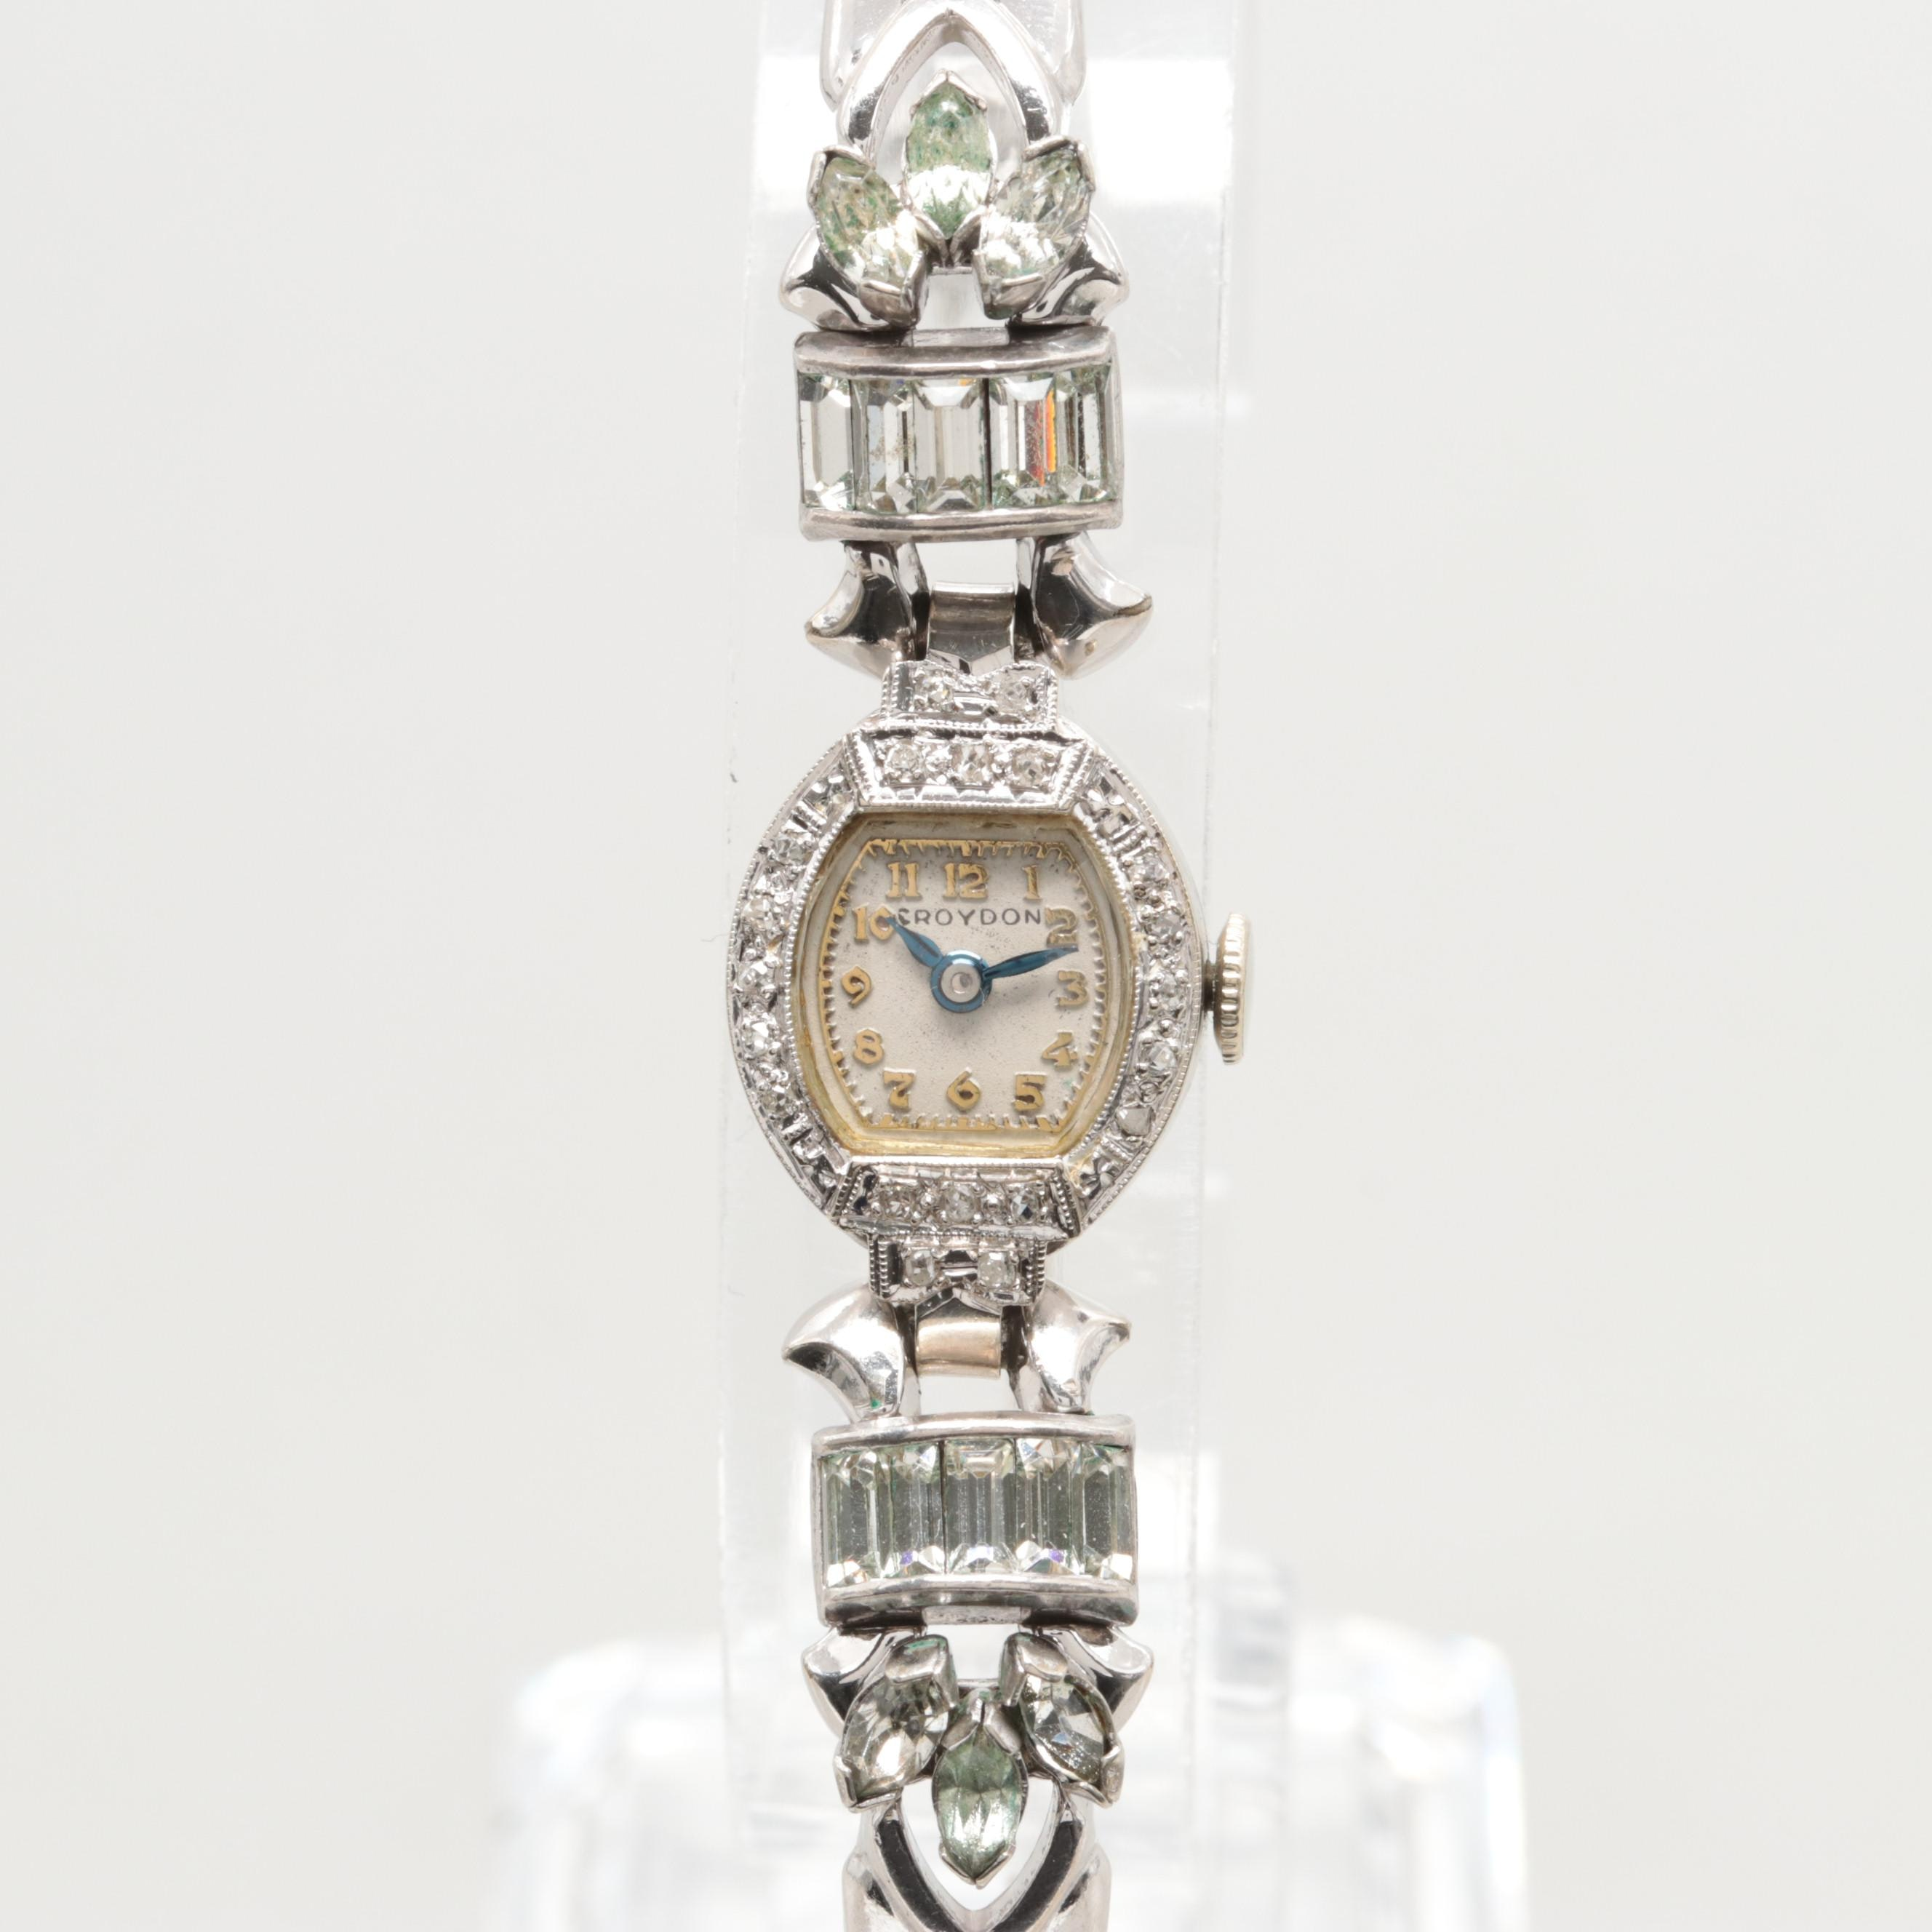 Vintage Croydon 14K White Gold Diamond Stem Wind Wristwatch